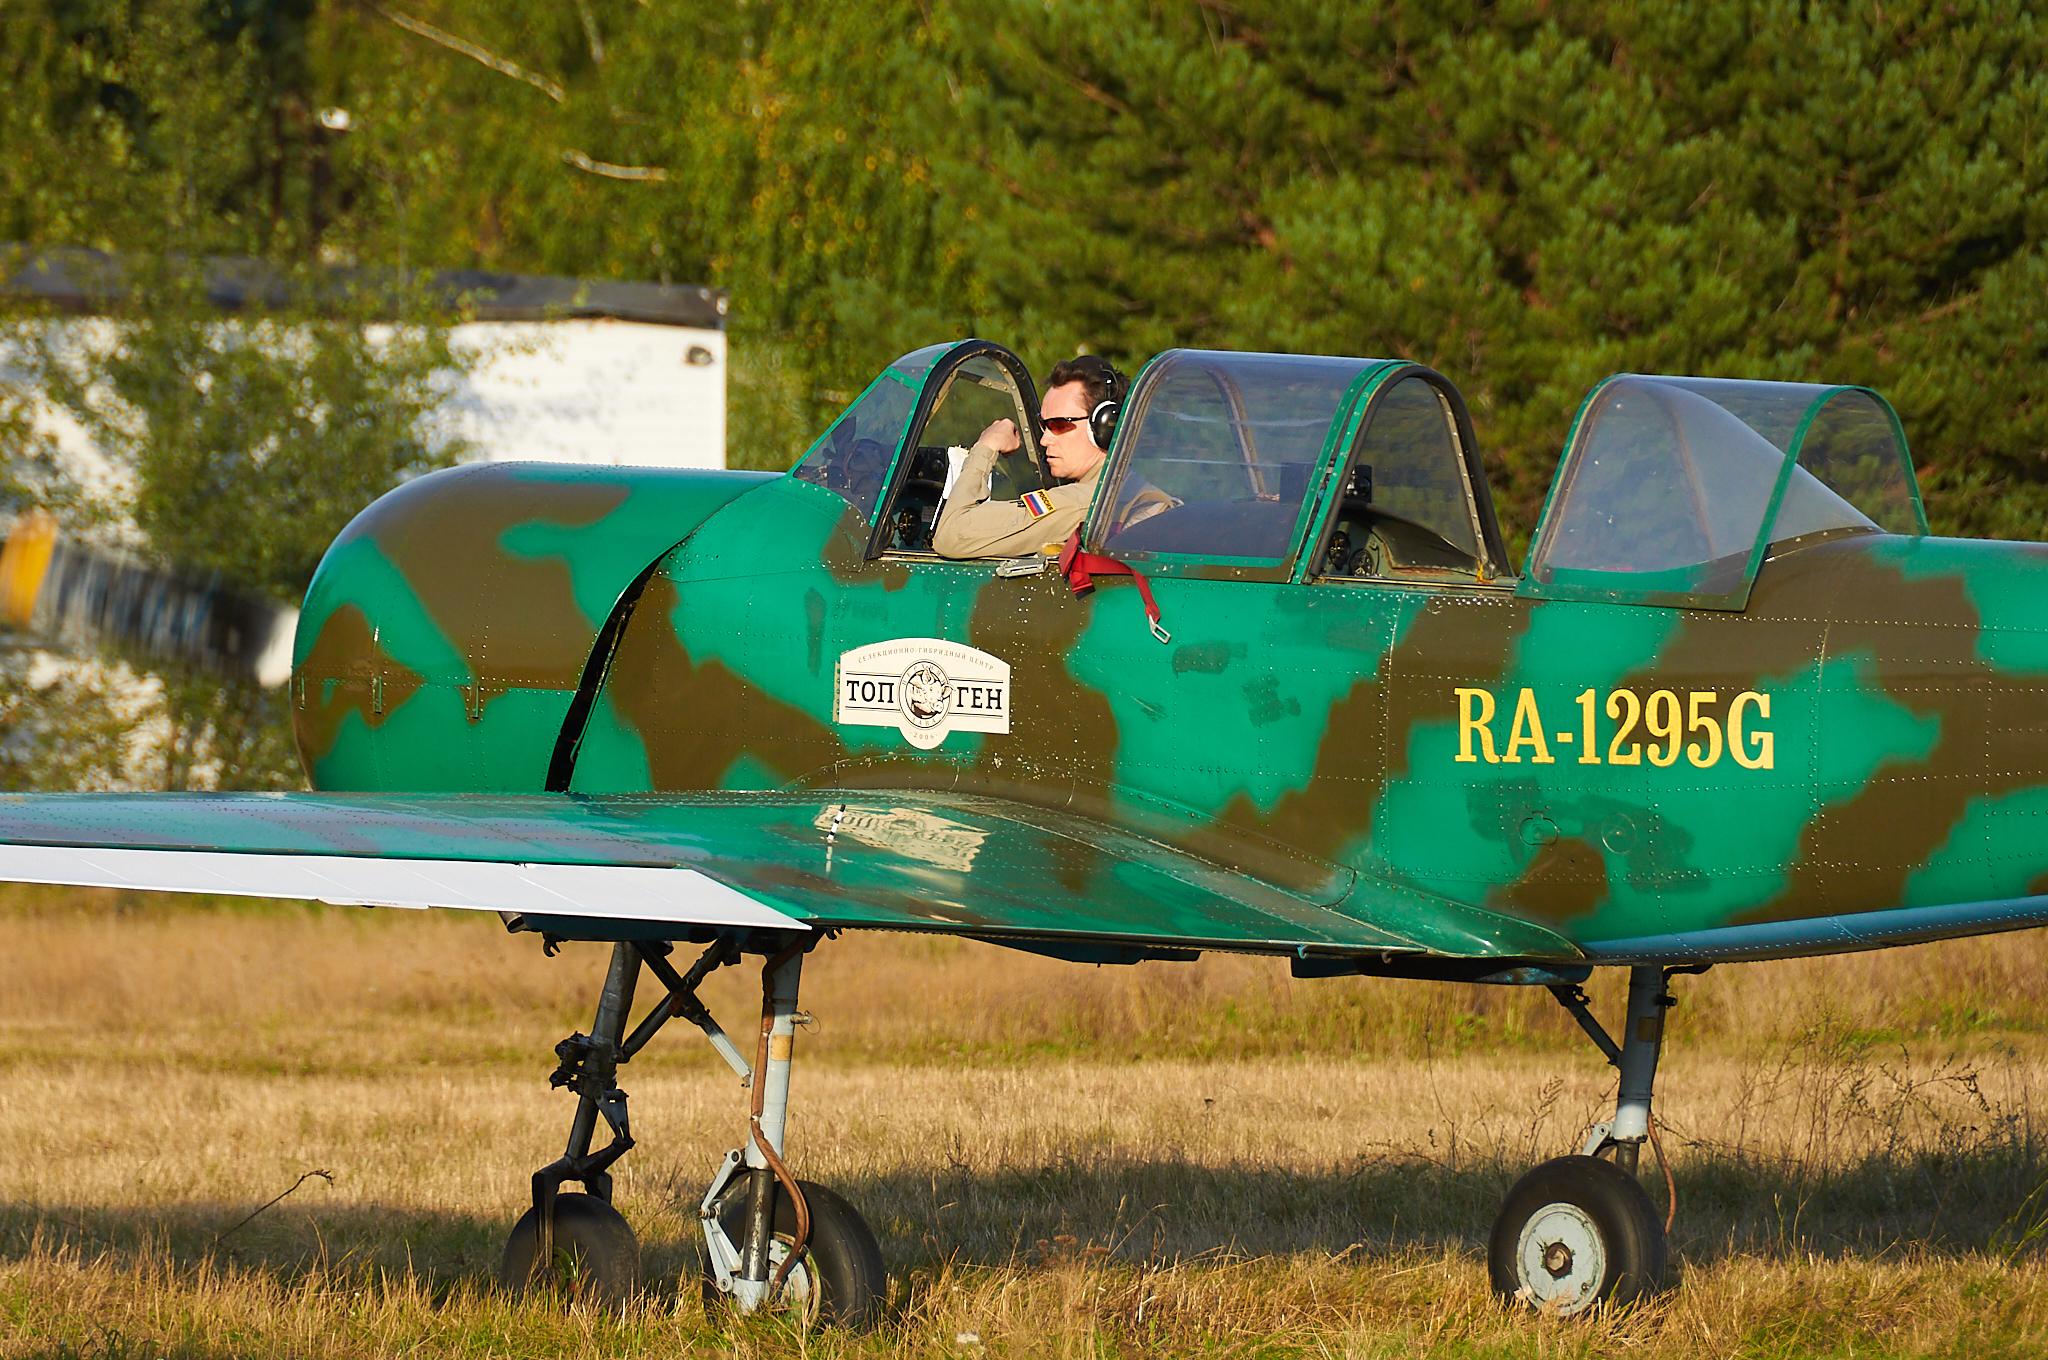 Andrey in a rented Yak-52 ~ Андрей в арендованном Як-52